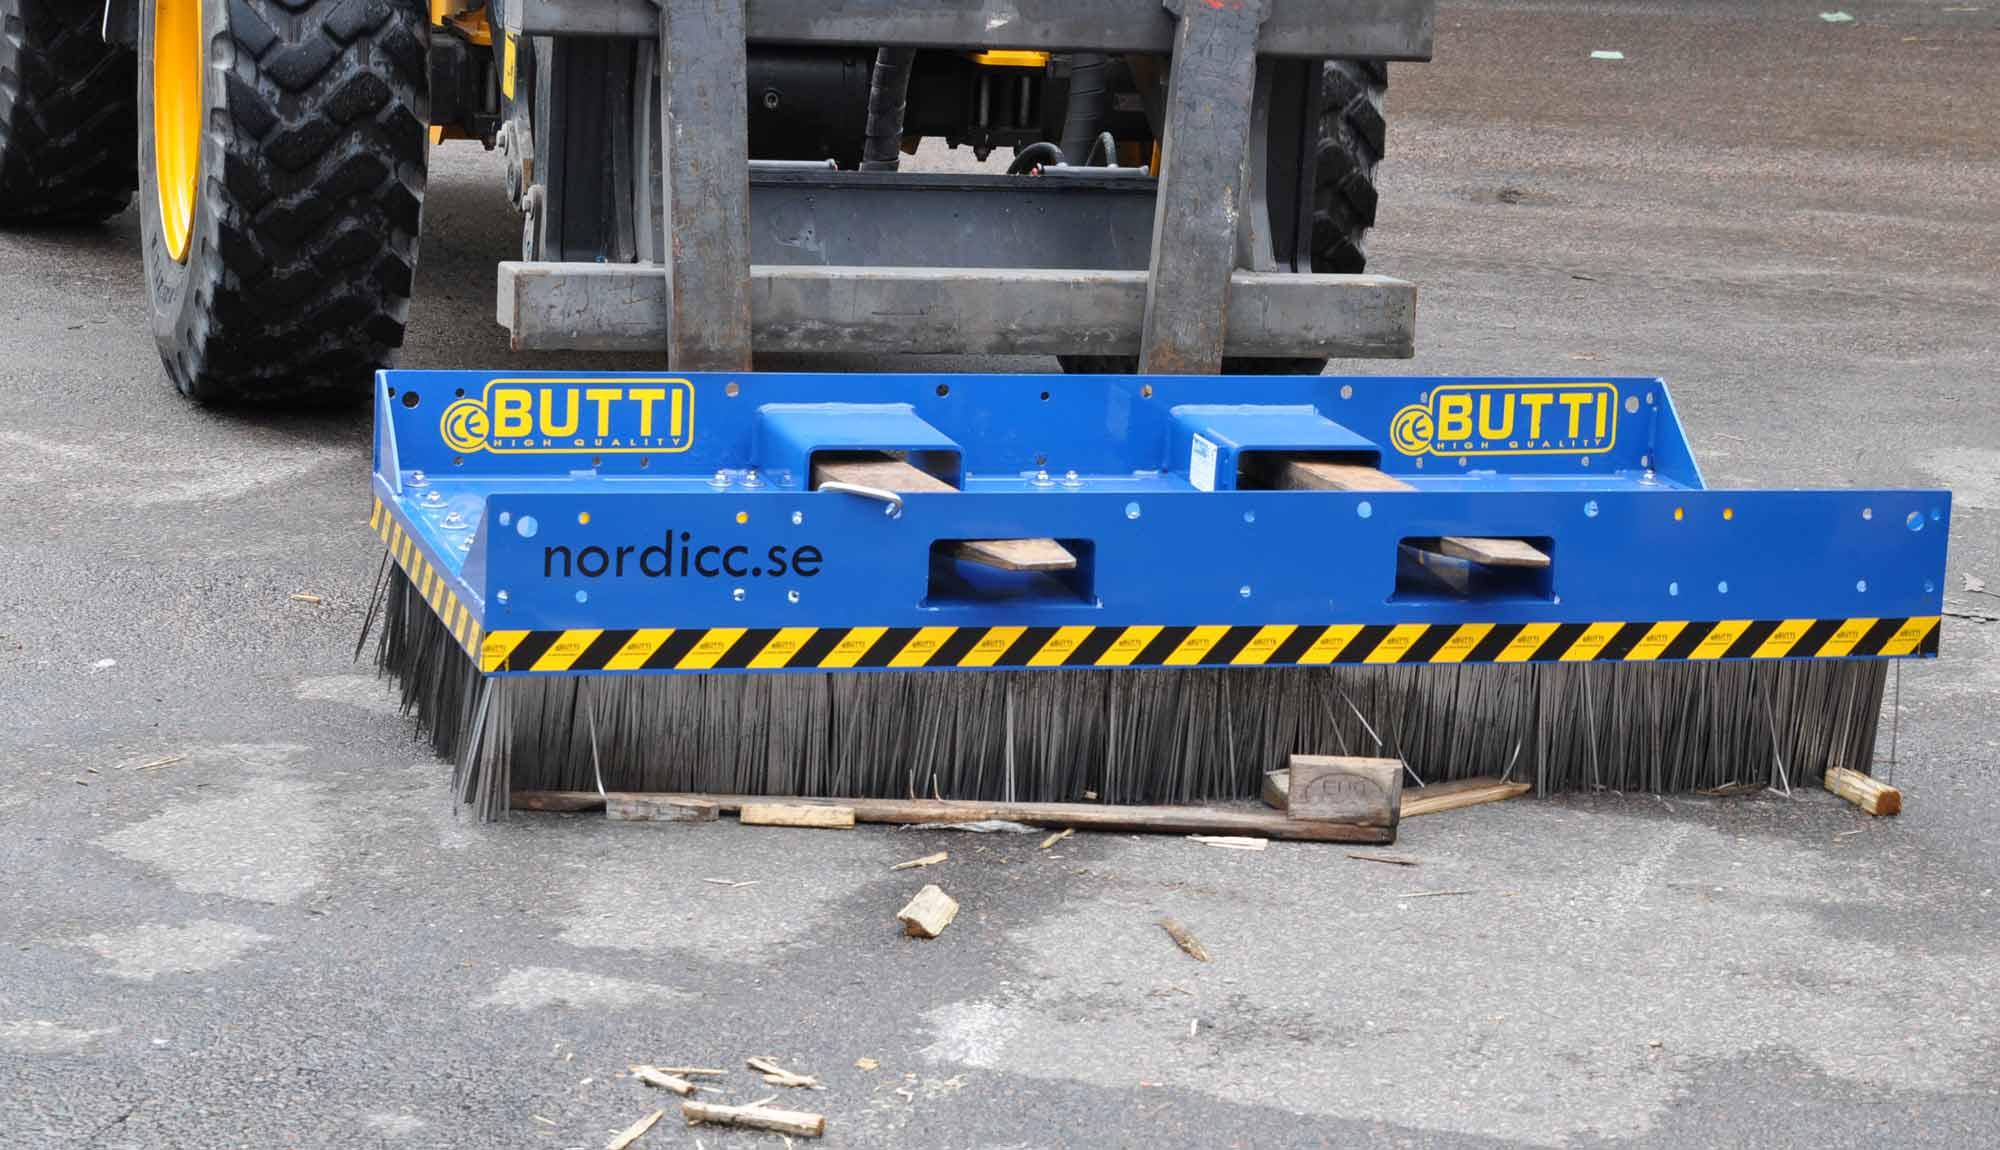 Butti stålborste från Nordicc